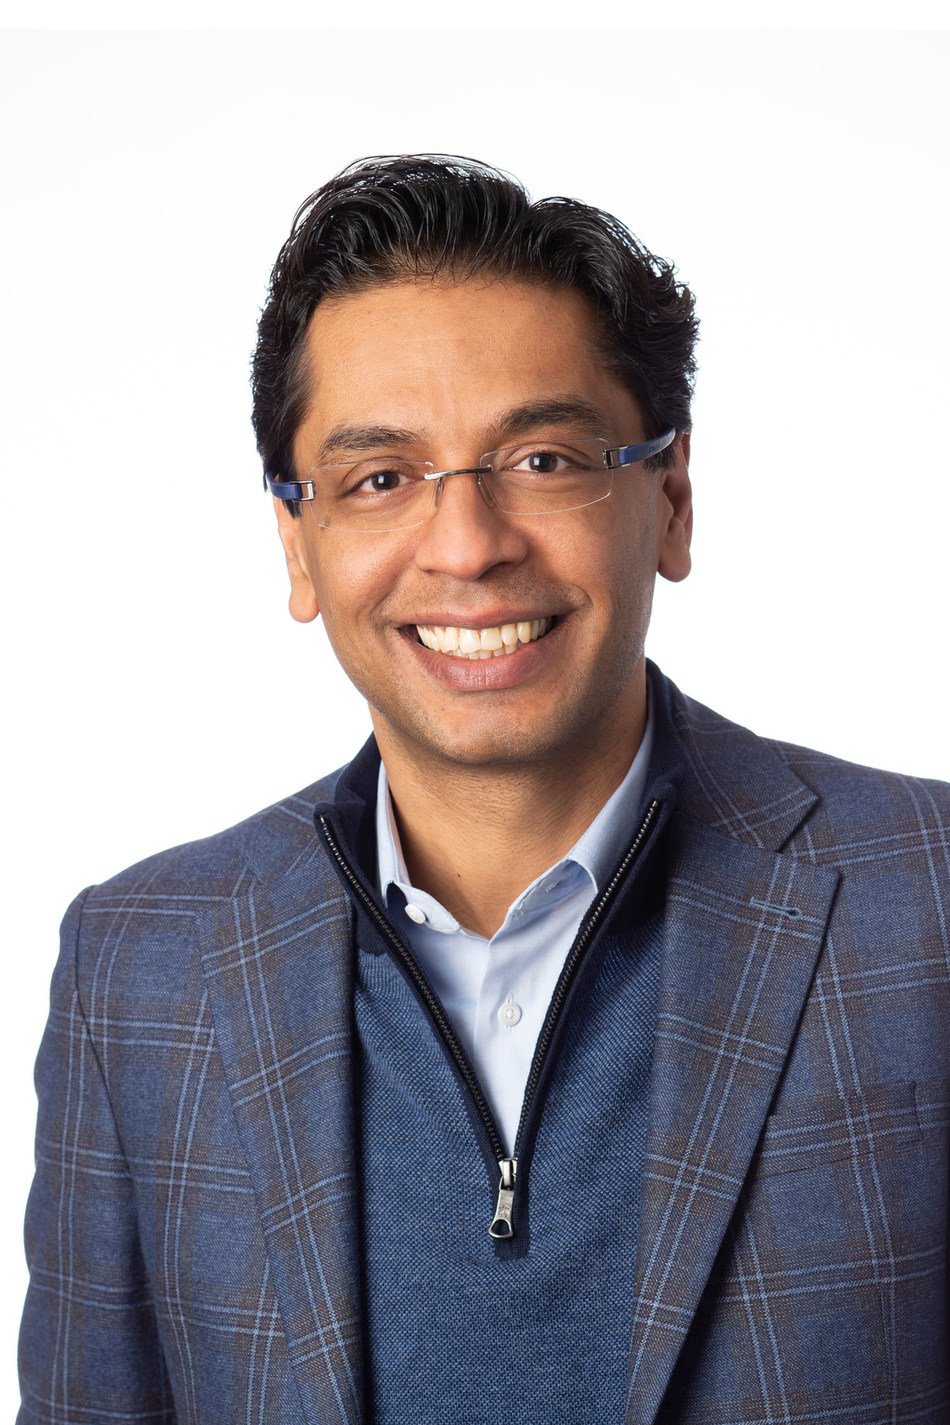 Dr. Nana Banerjee, President & CEO, McGraw-Hill Education